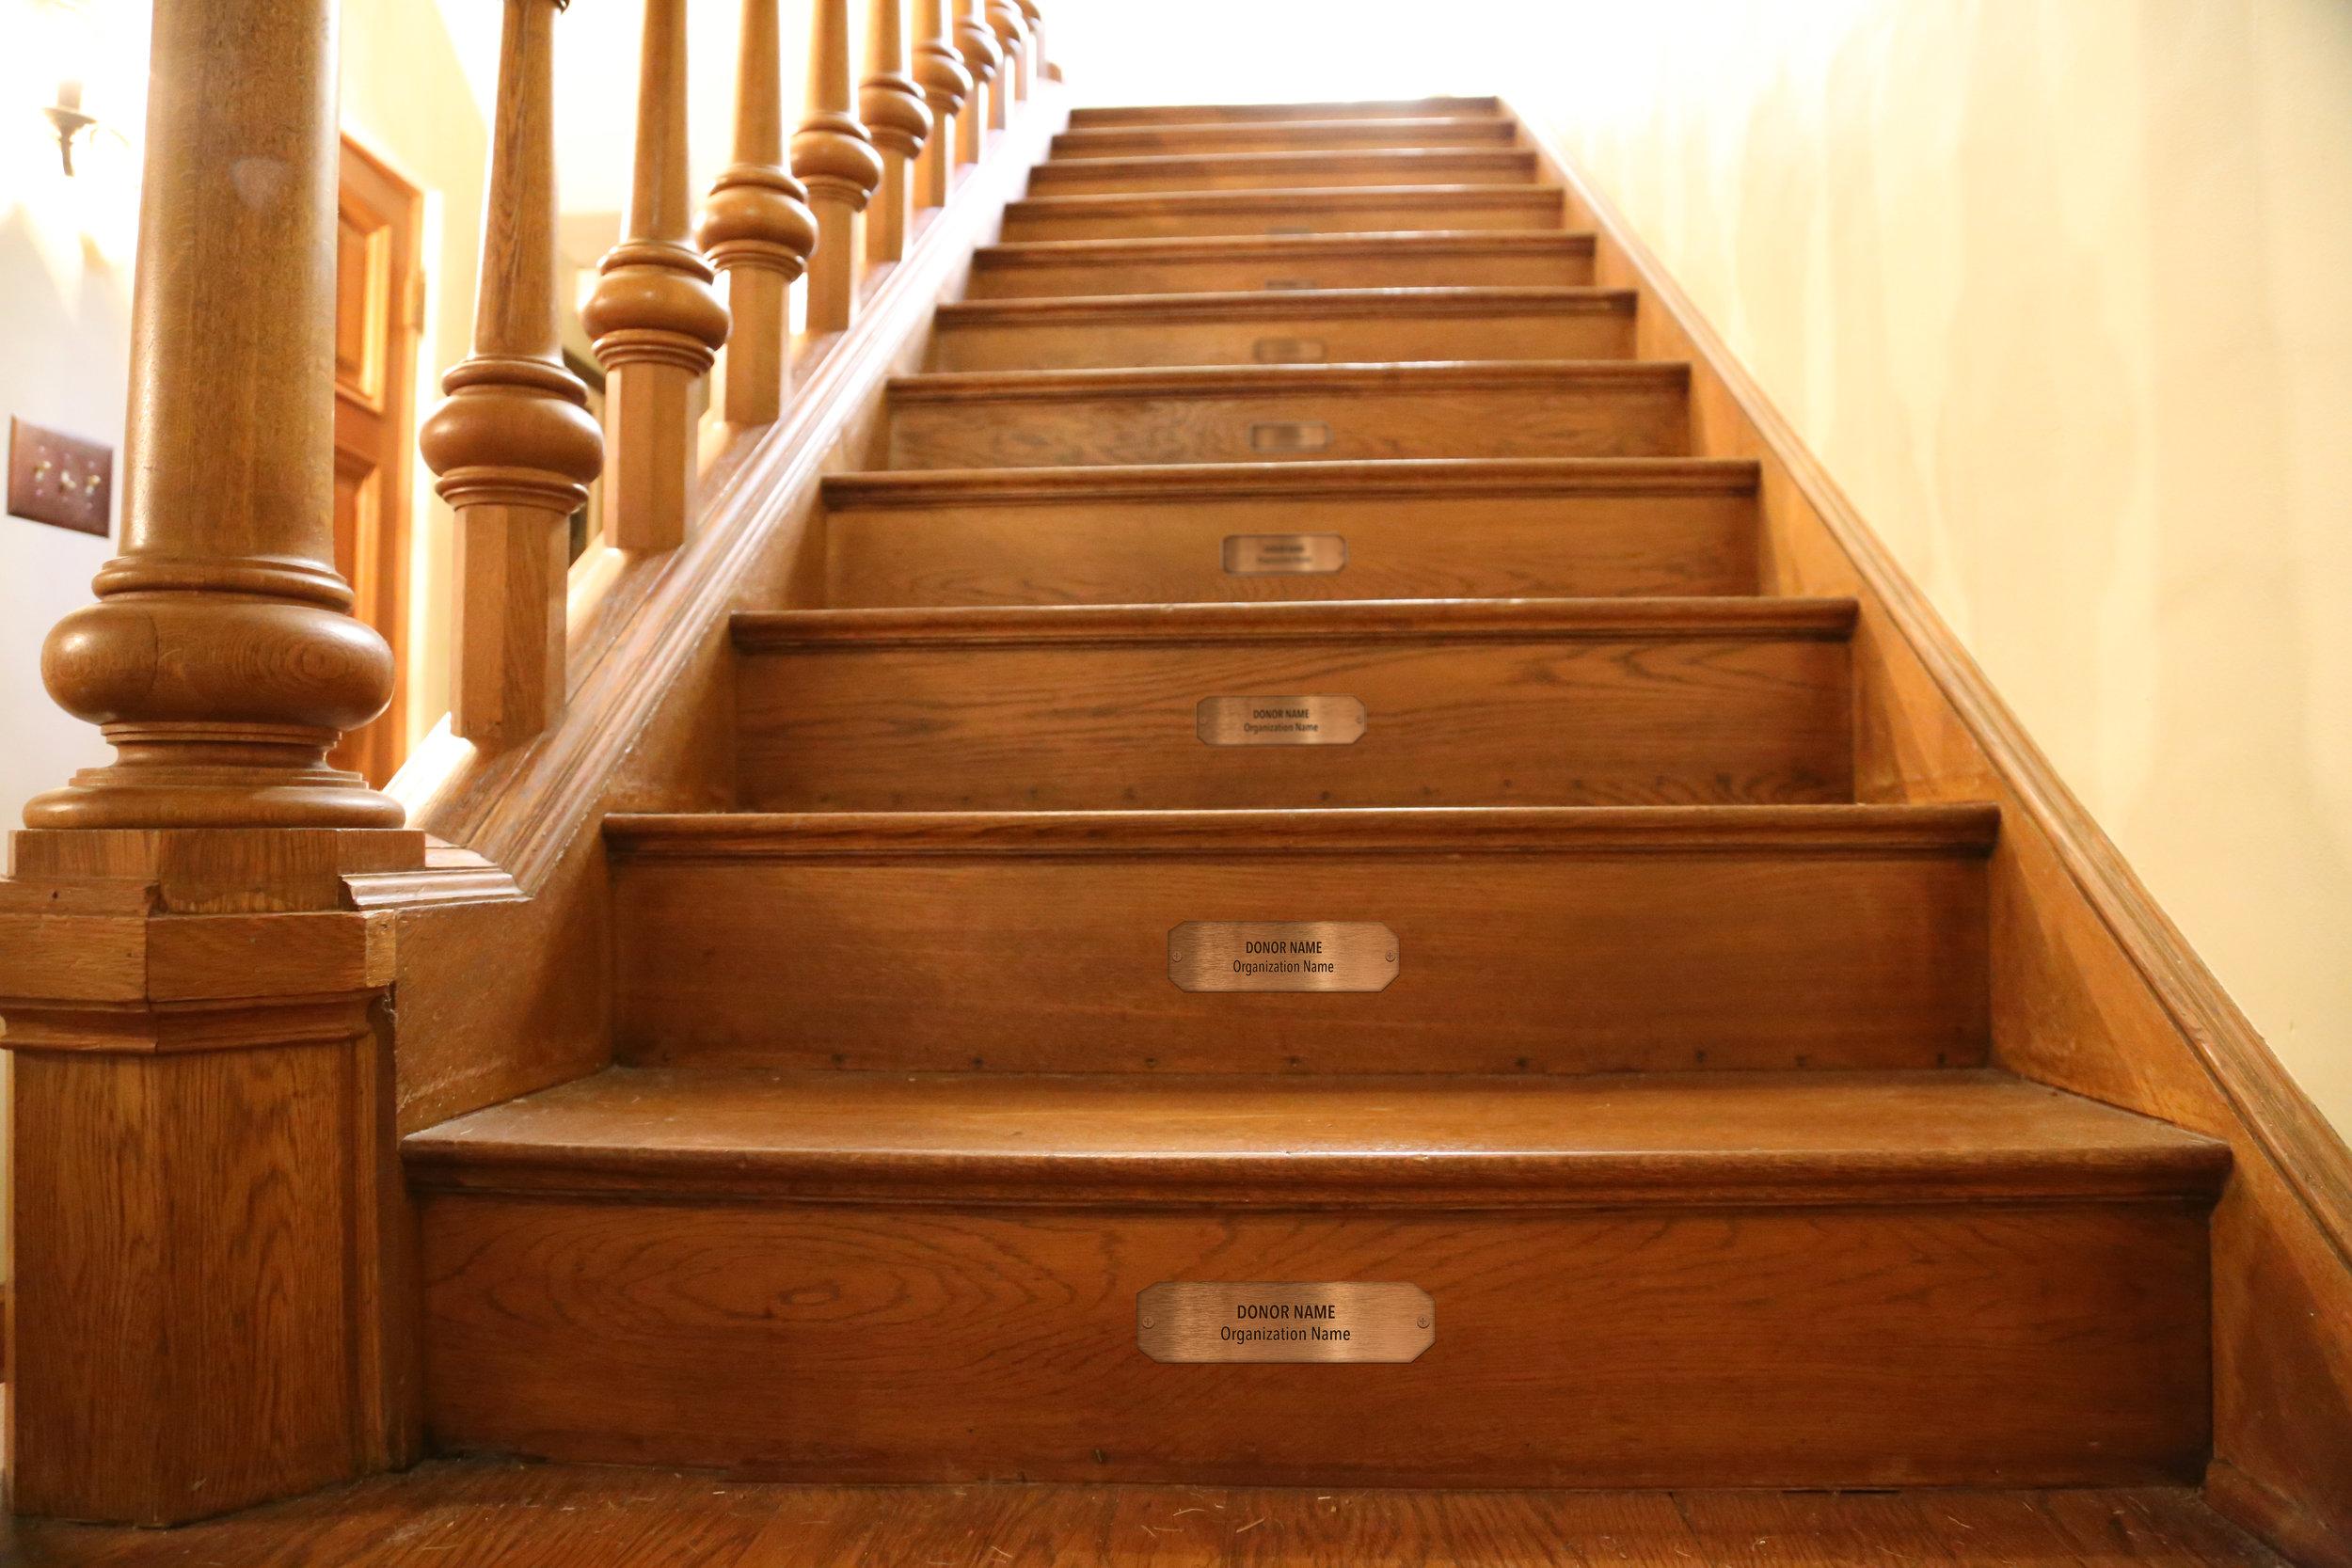 TM-stair-riser2.jpg